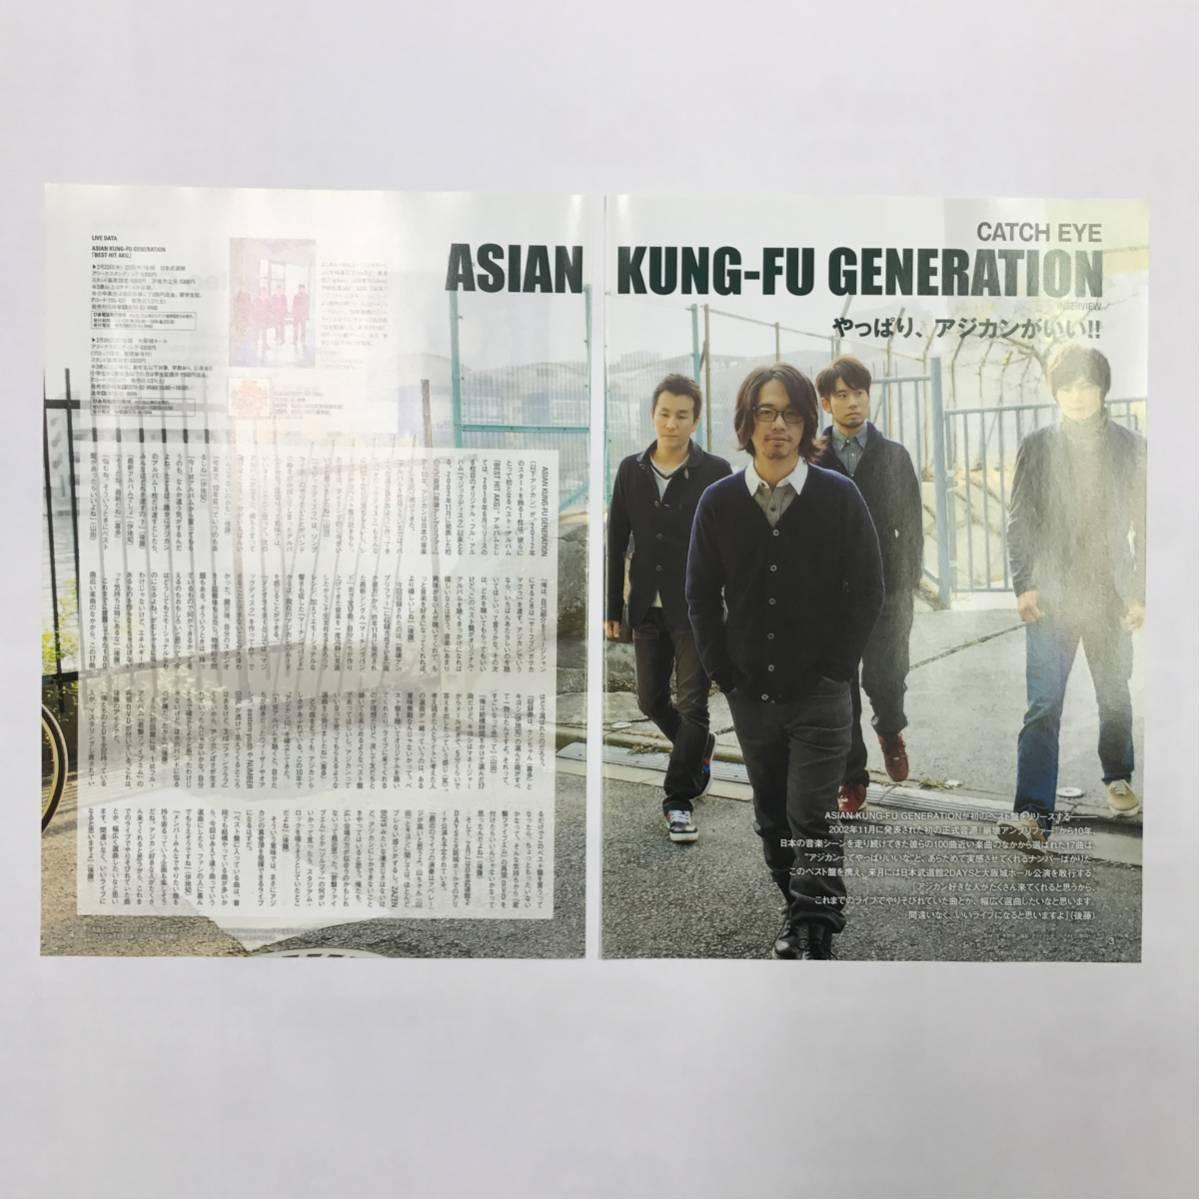 「ASIAN KUNG-FU GENERATION」切り抜き